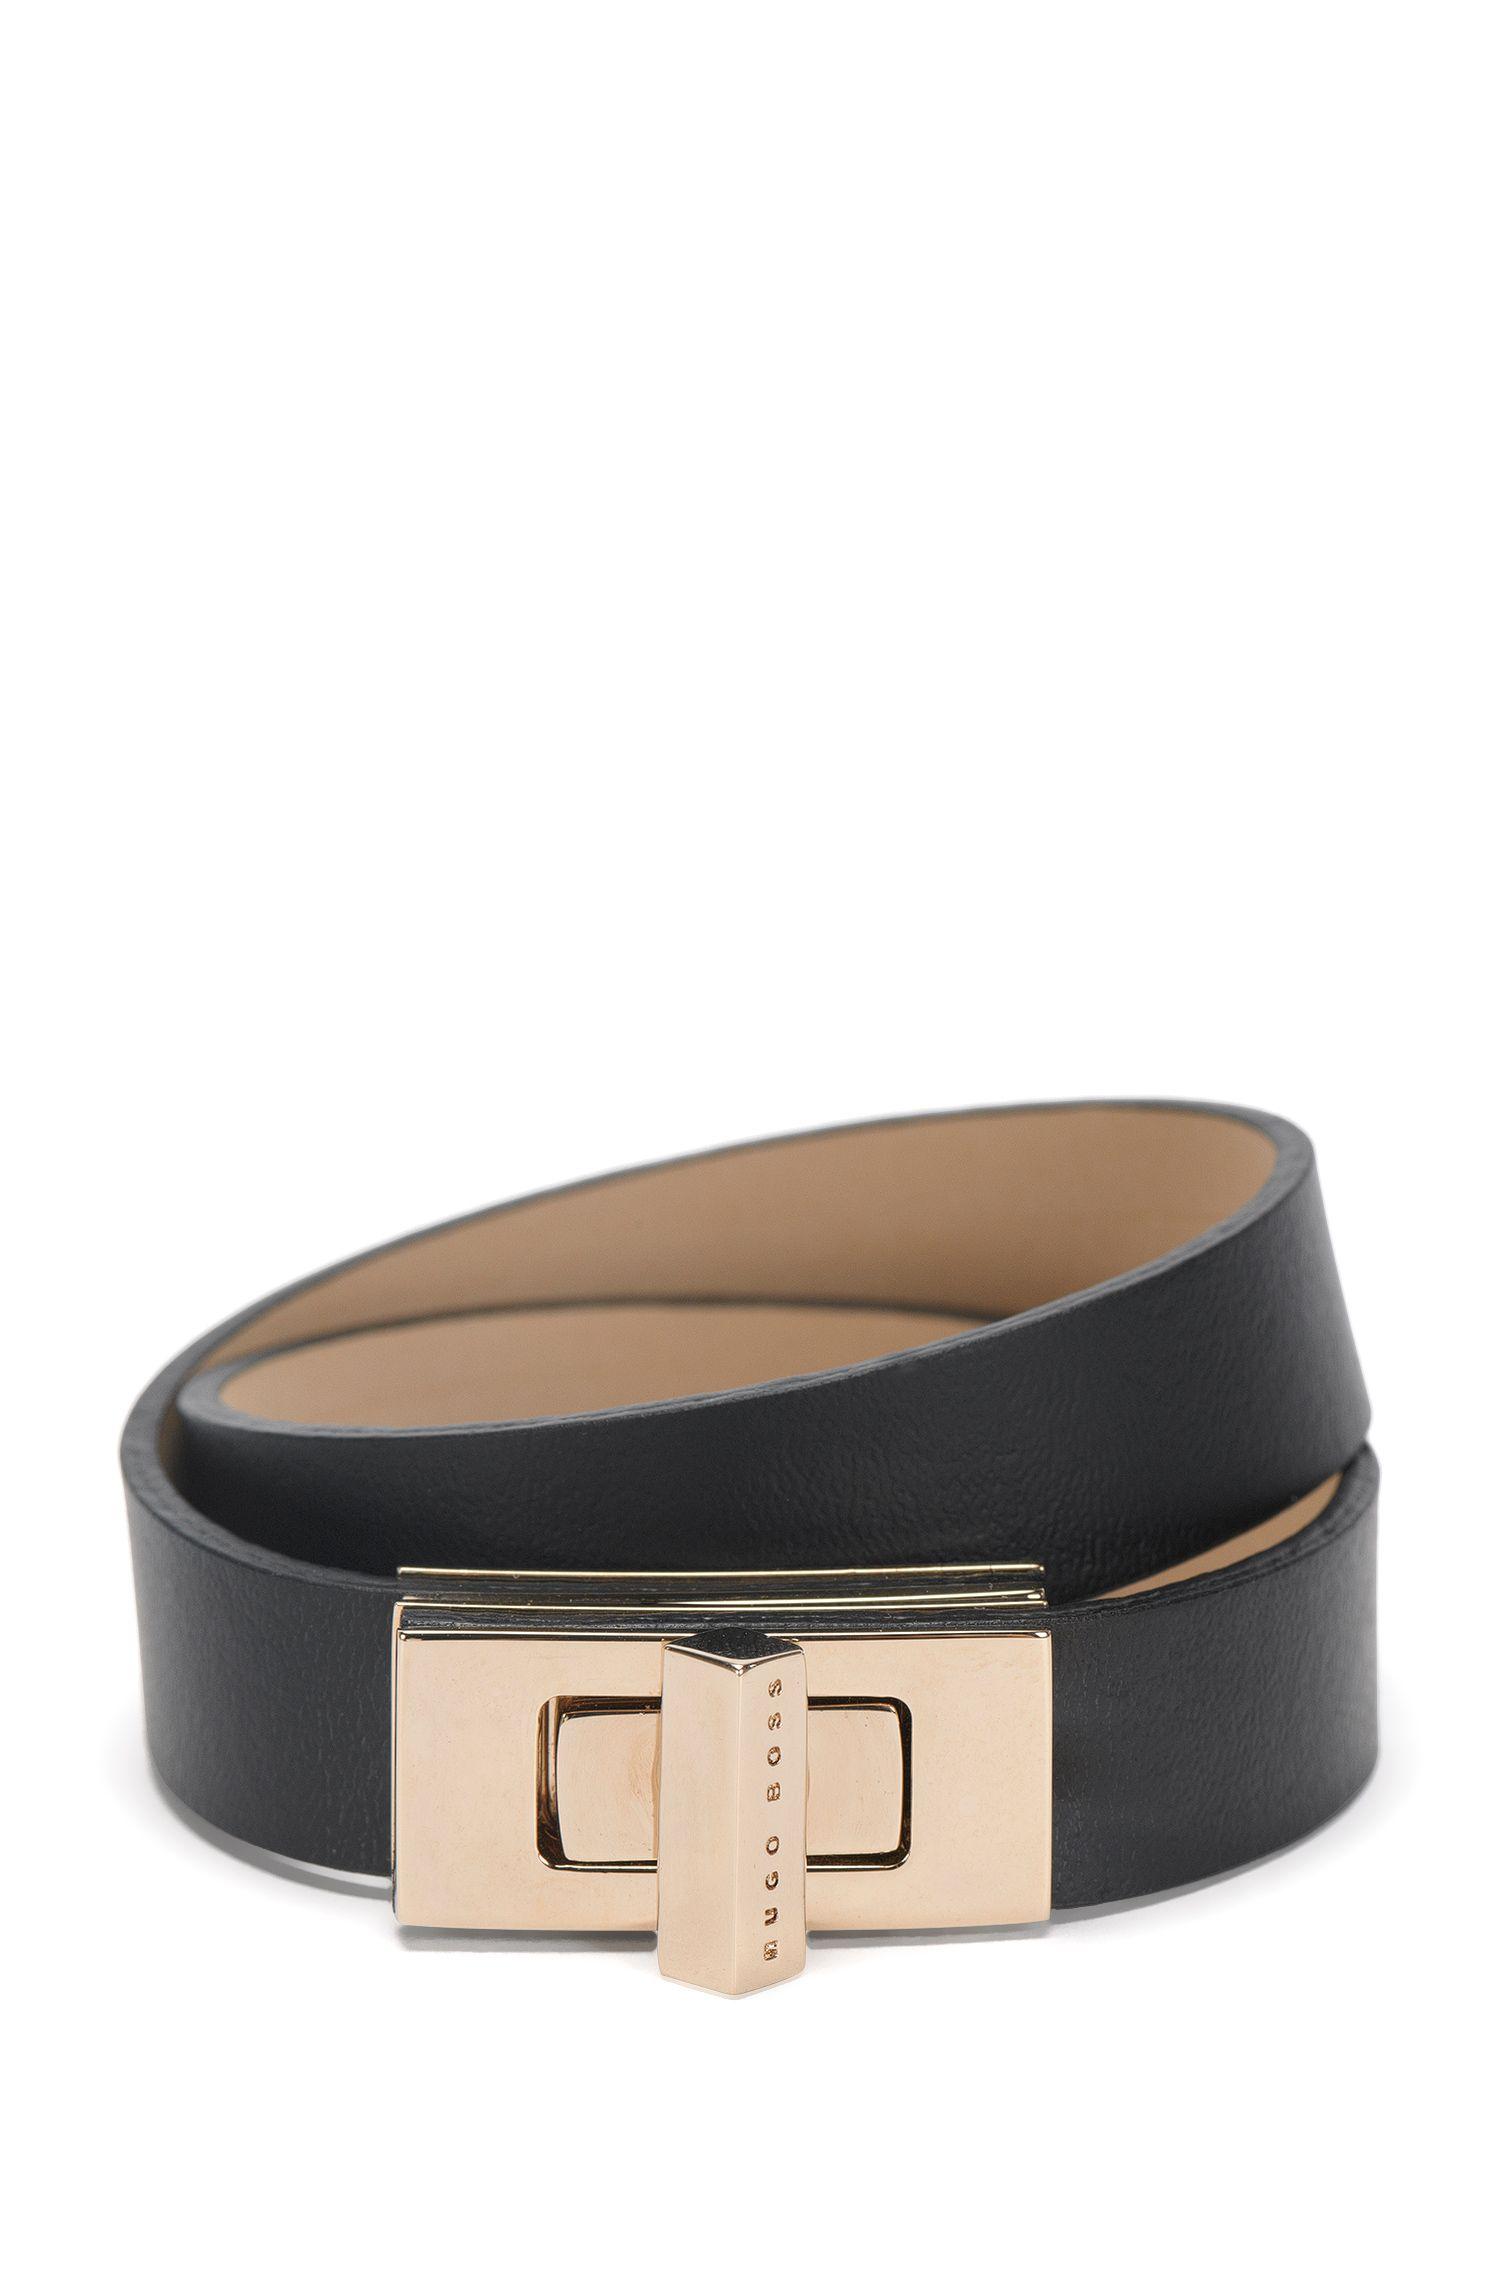 Effen BOSS Bespoke-armband van leer